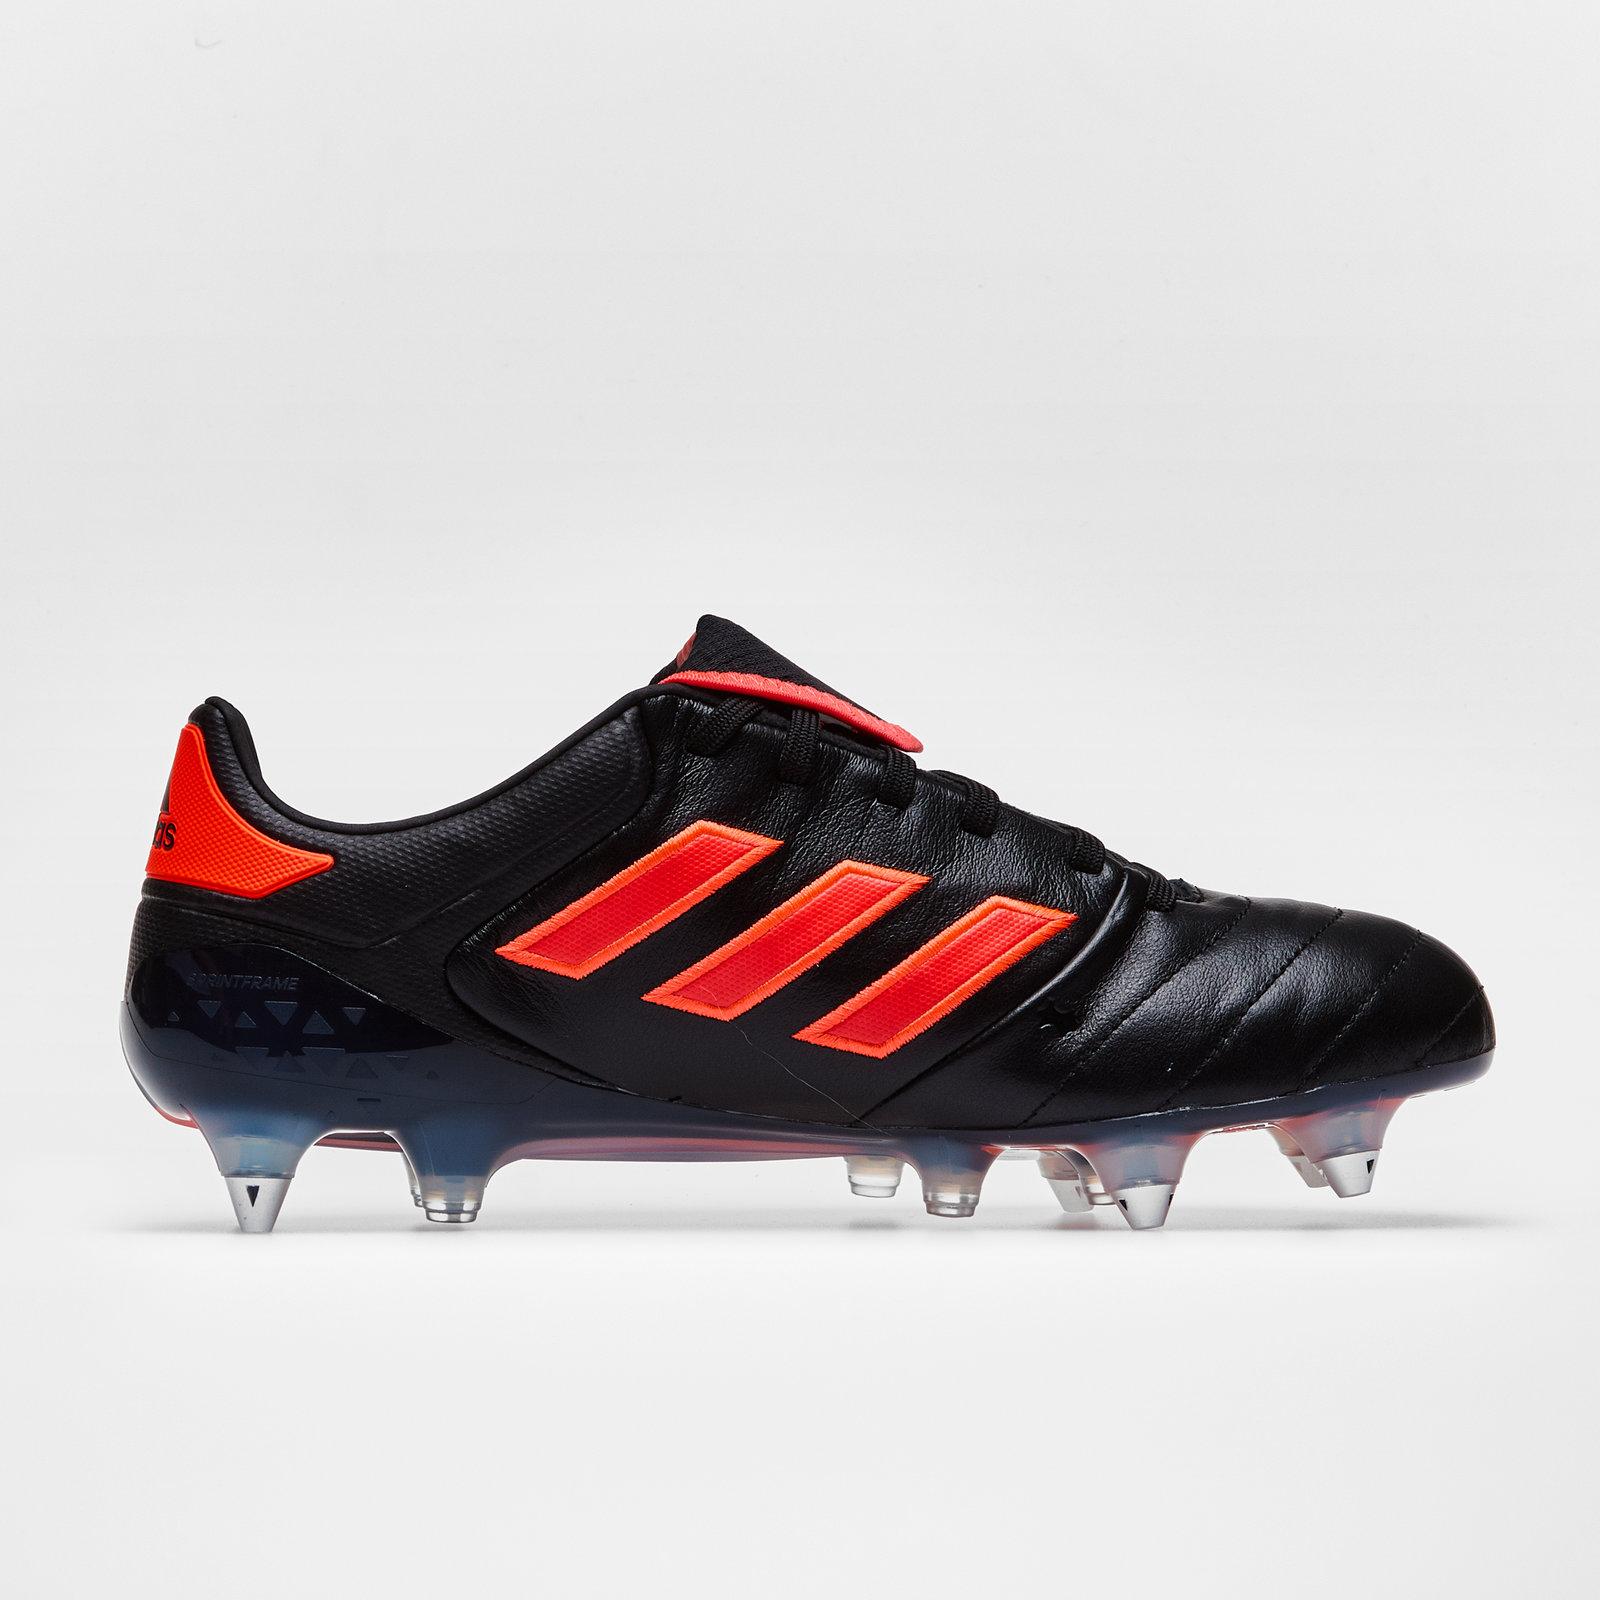 93d6a5638 adidas Copa 17.1 SG Football Boots